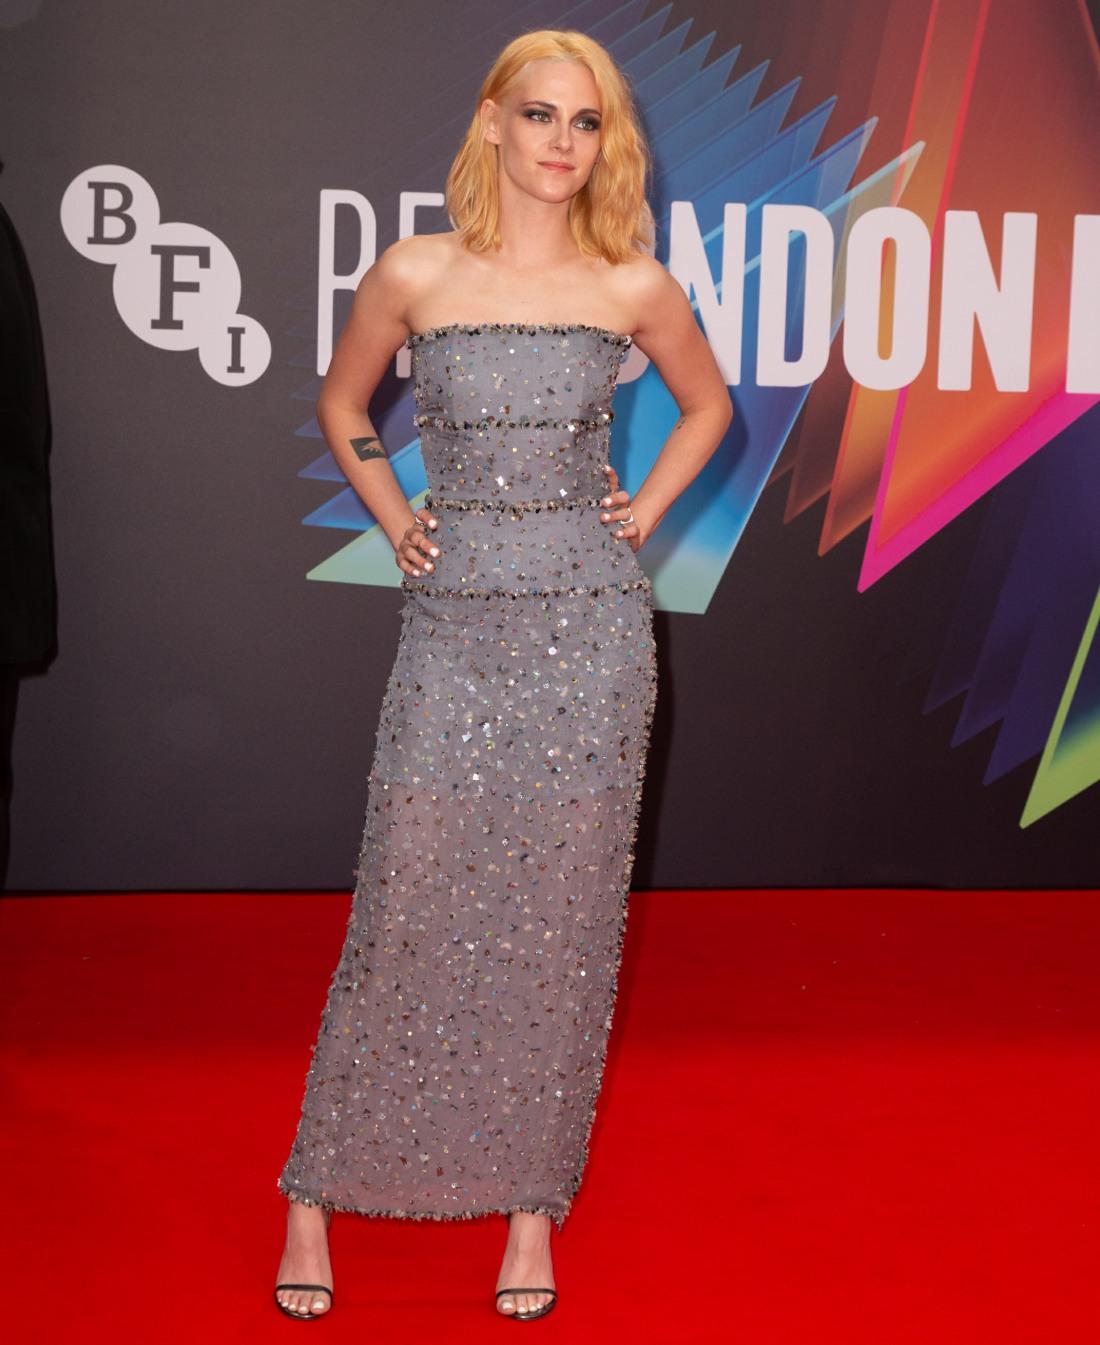 The BFI 65th London Film Festival Headline Gala of 'Spencer' held at the Royal Festival Hall